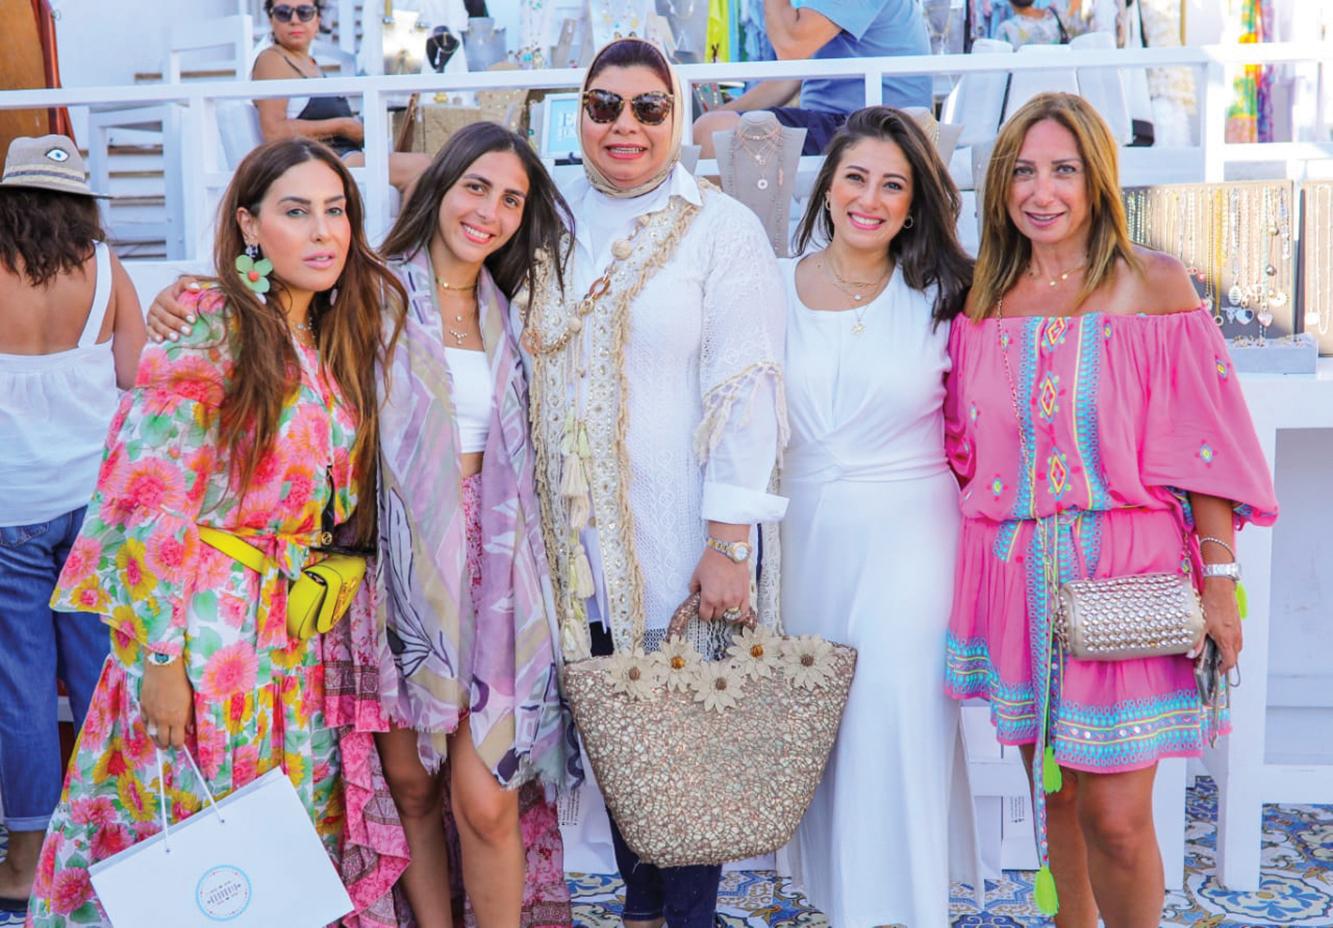 Ms. Salma Fathalla, Ms. Shahira Wahdan & friends copy